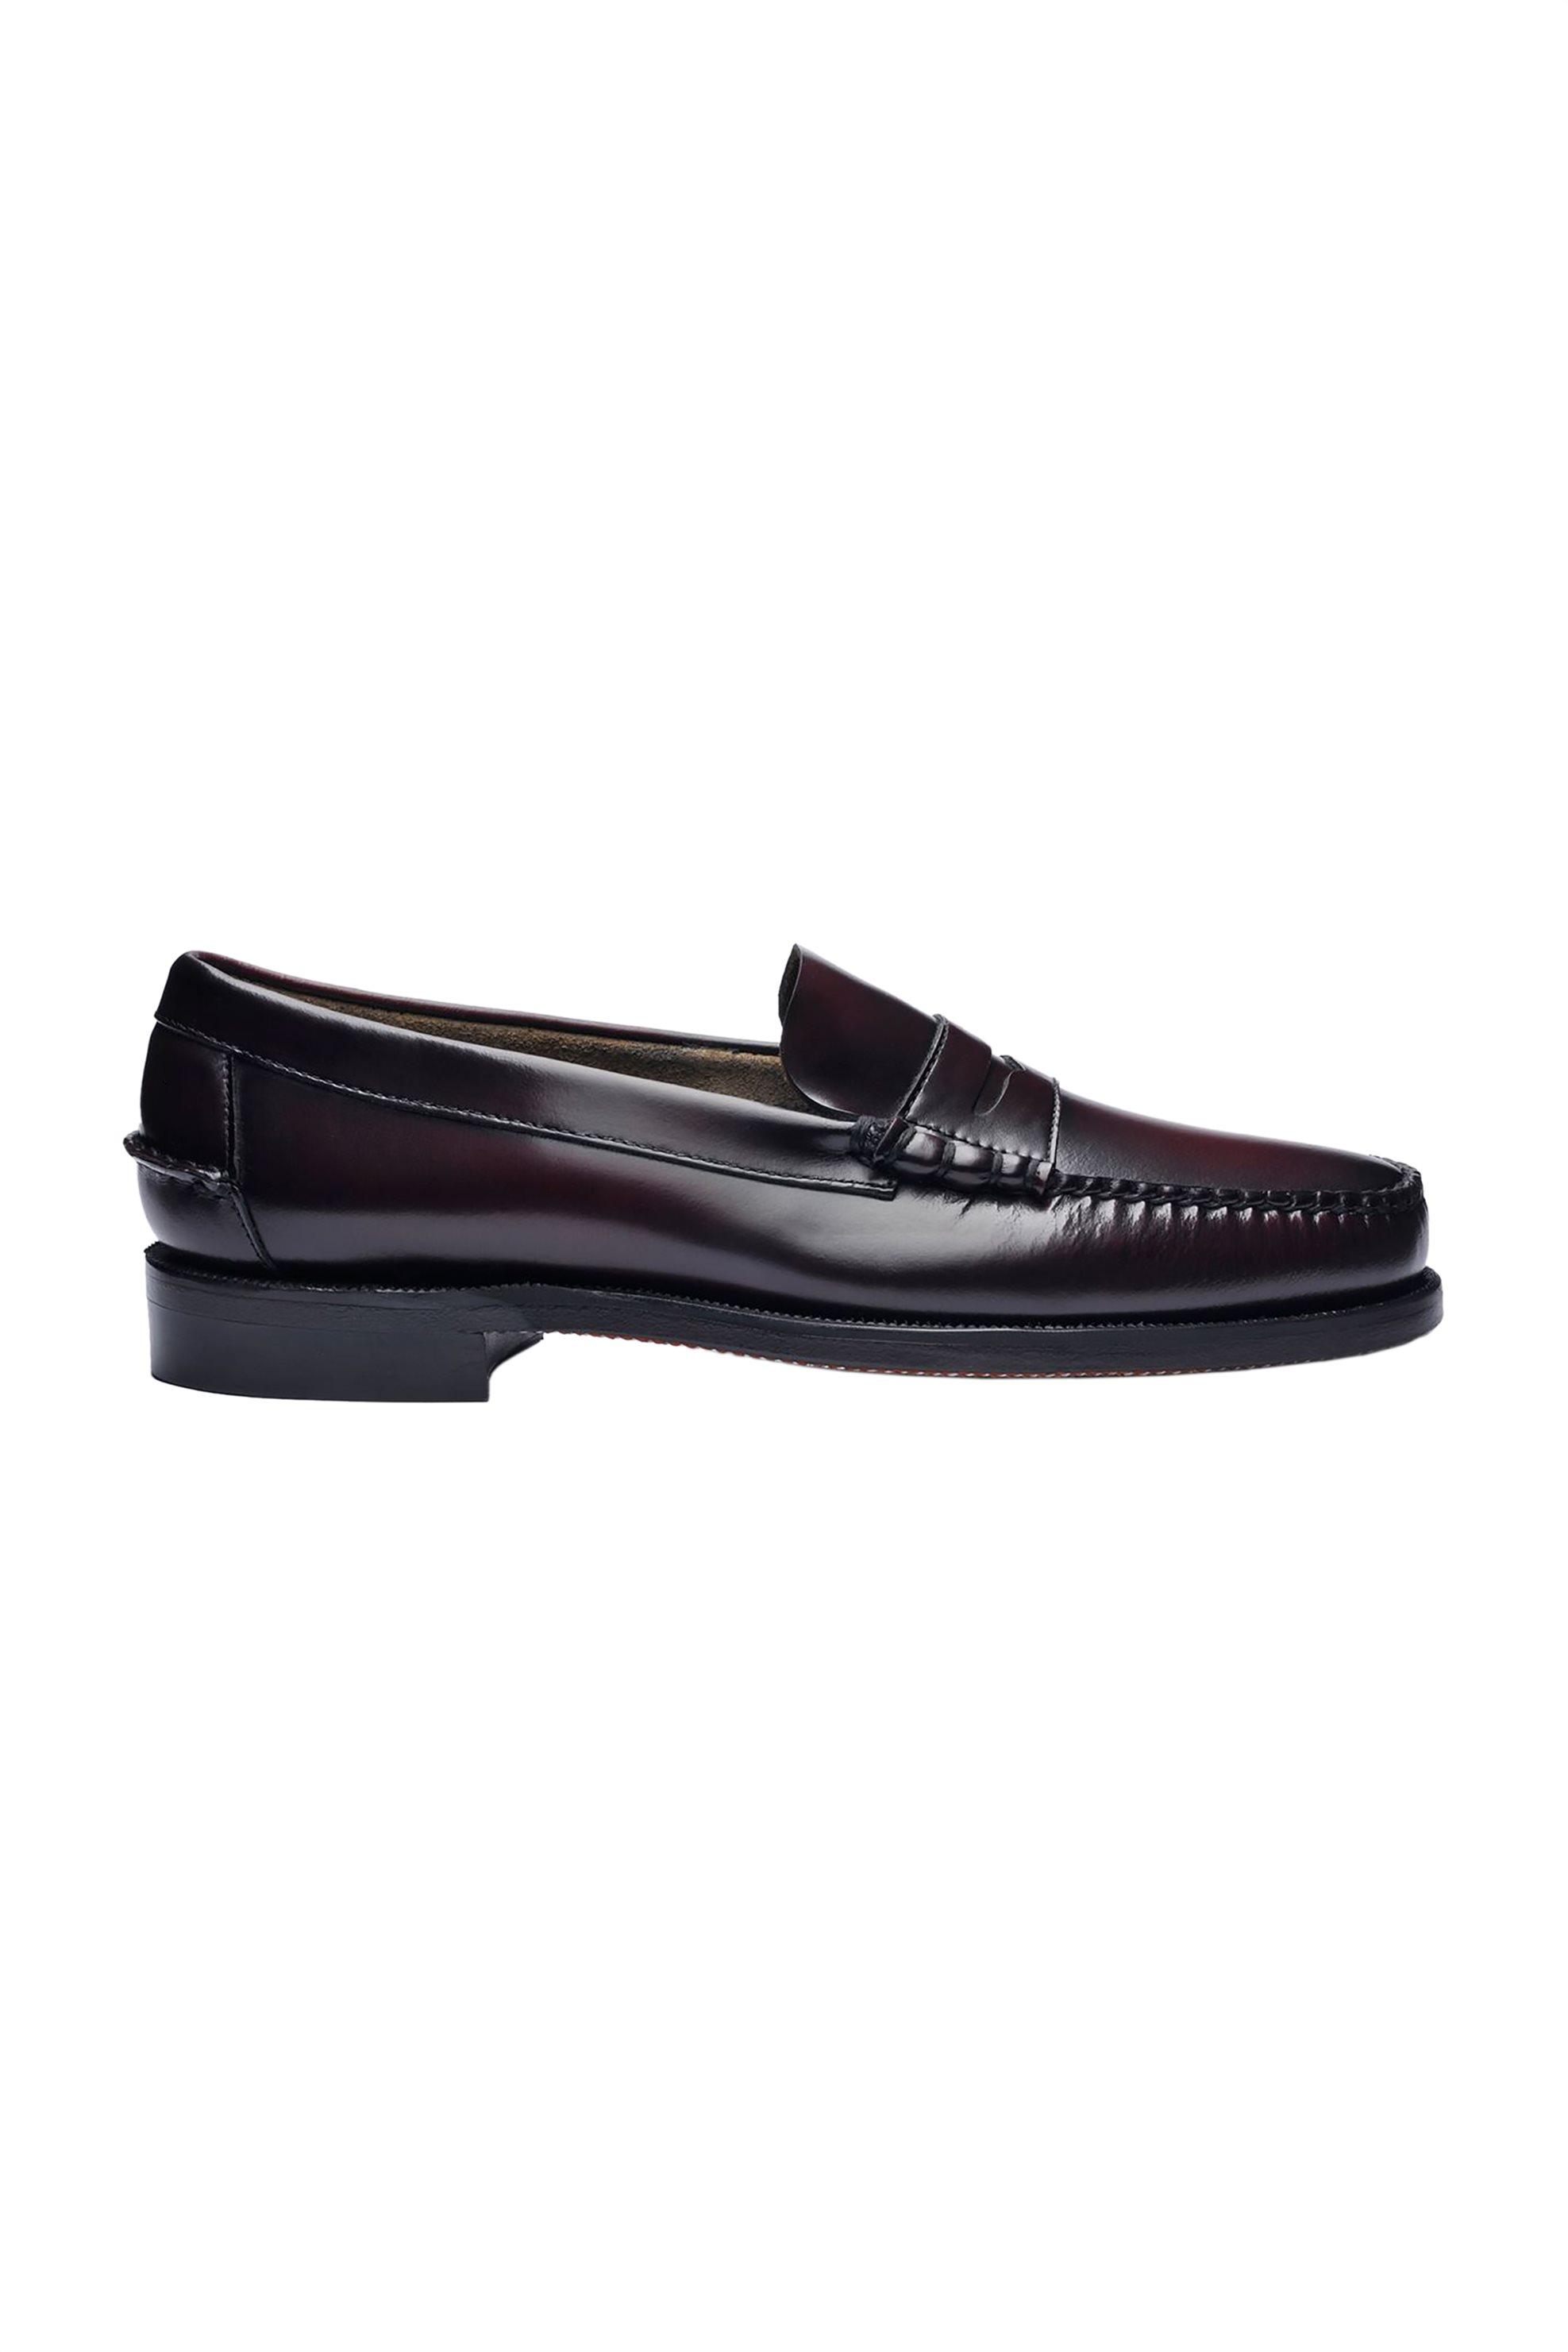 c9d14c84677 Notos Sebago ανδρικα loafers δερματινα Classic Dan - L7000300-903 - Καφε